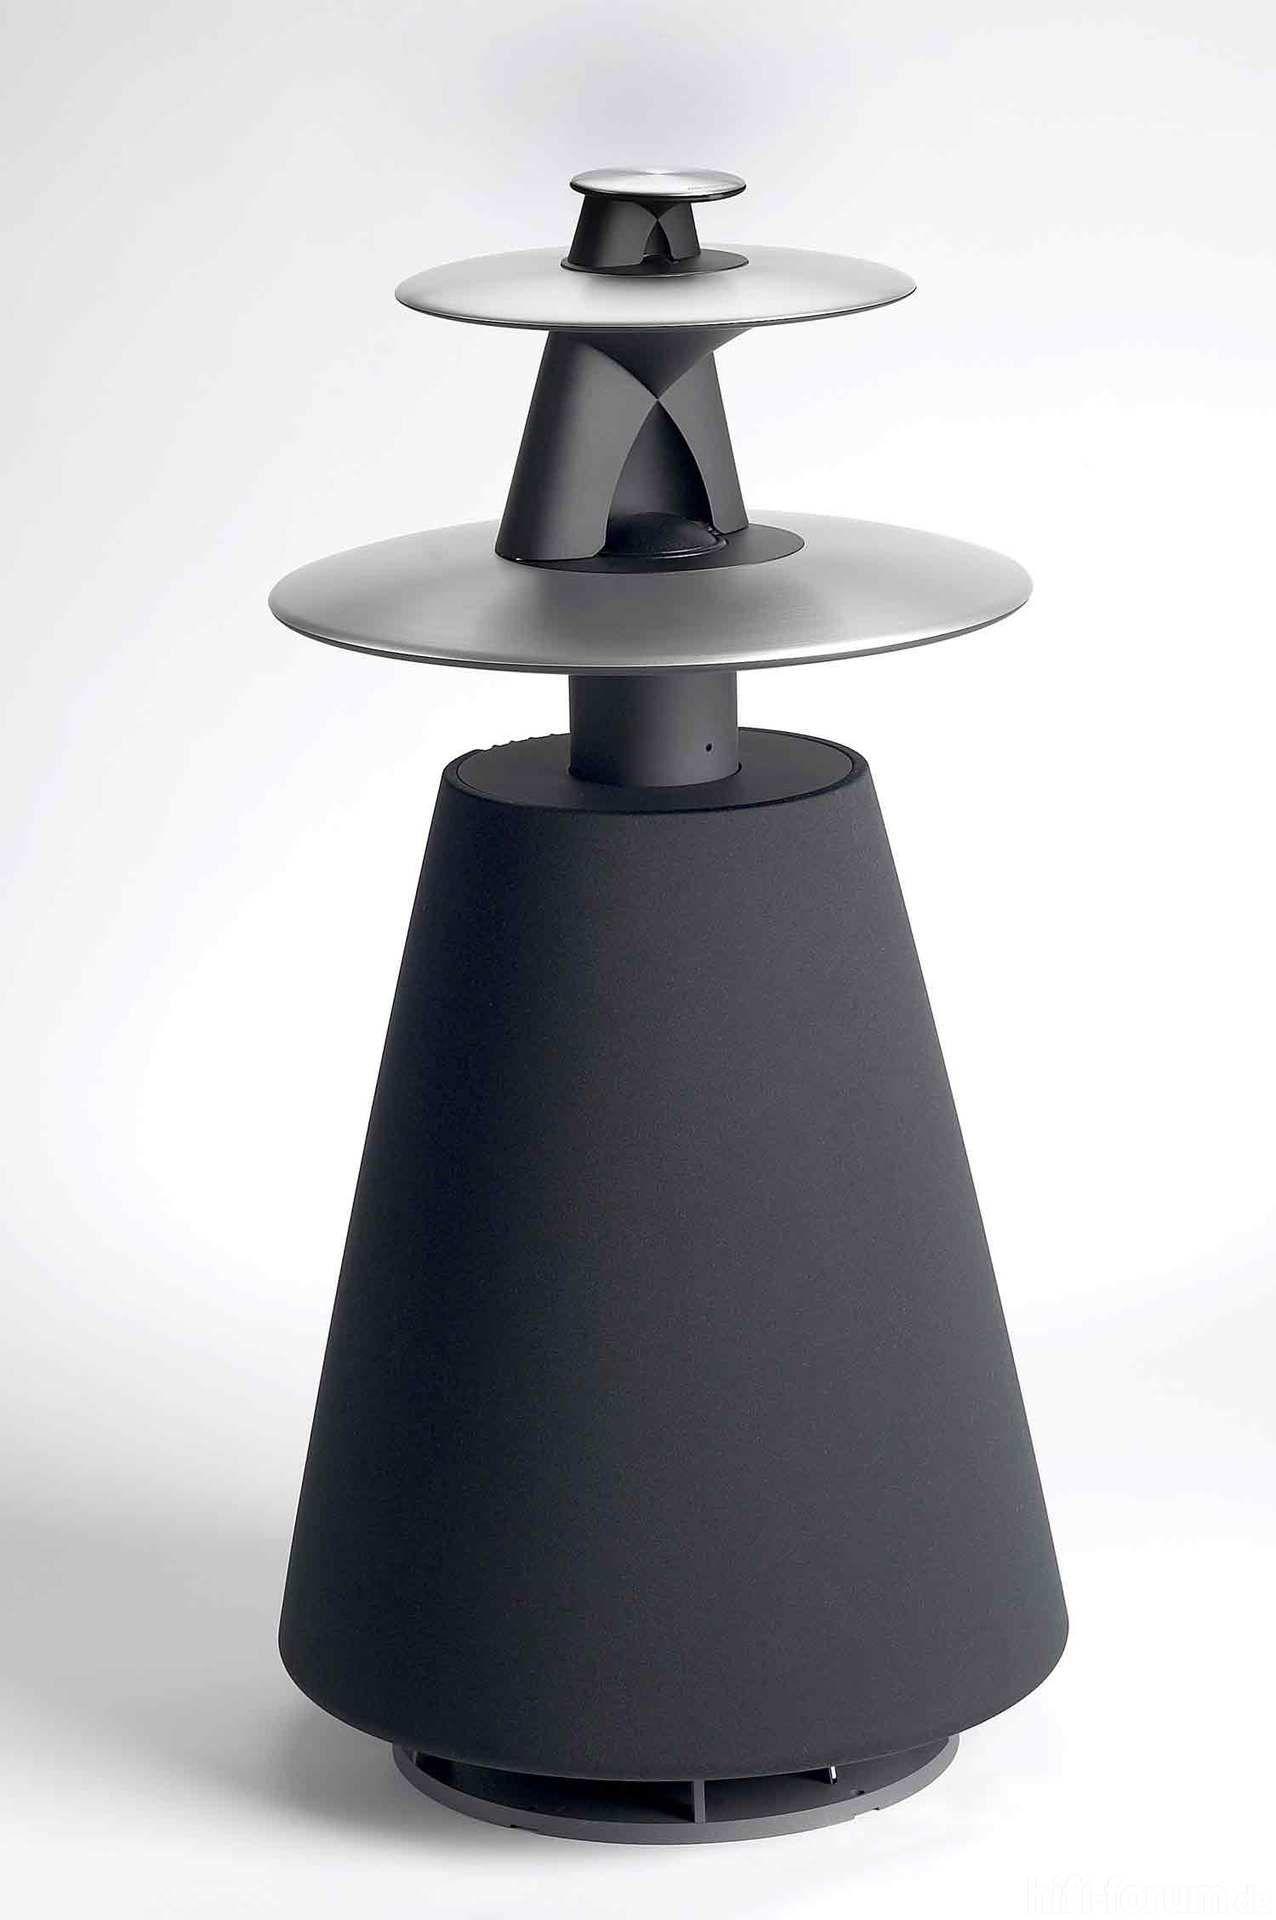 bang olufsen beolab 5 the best speaker in the world. Black Bedroom Furniture Sets. Home Design Ideas